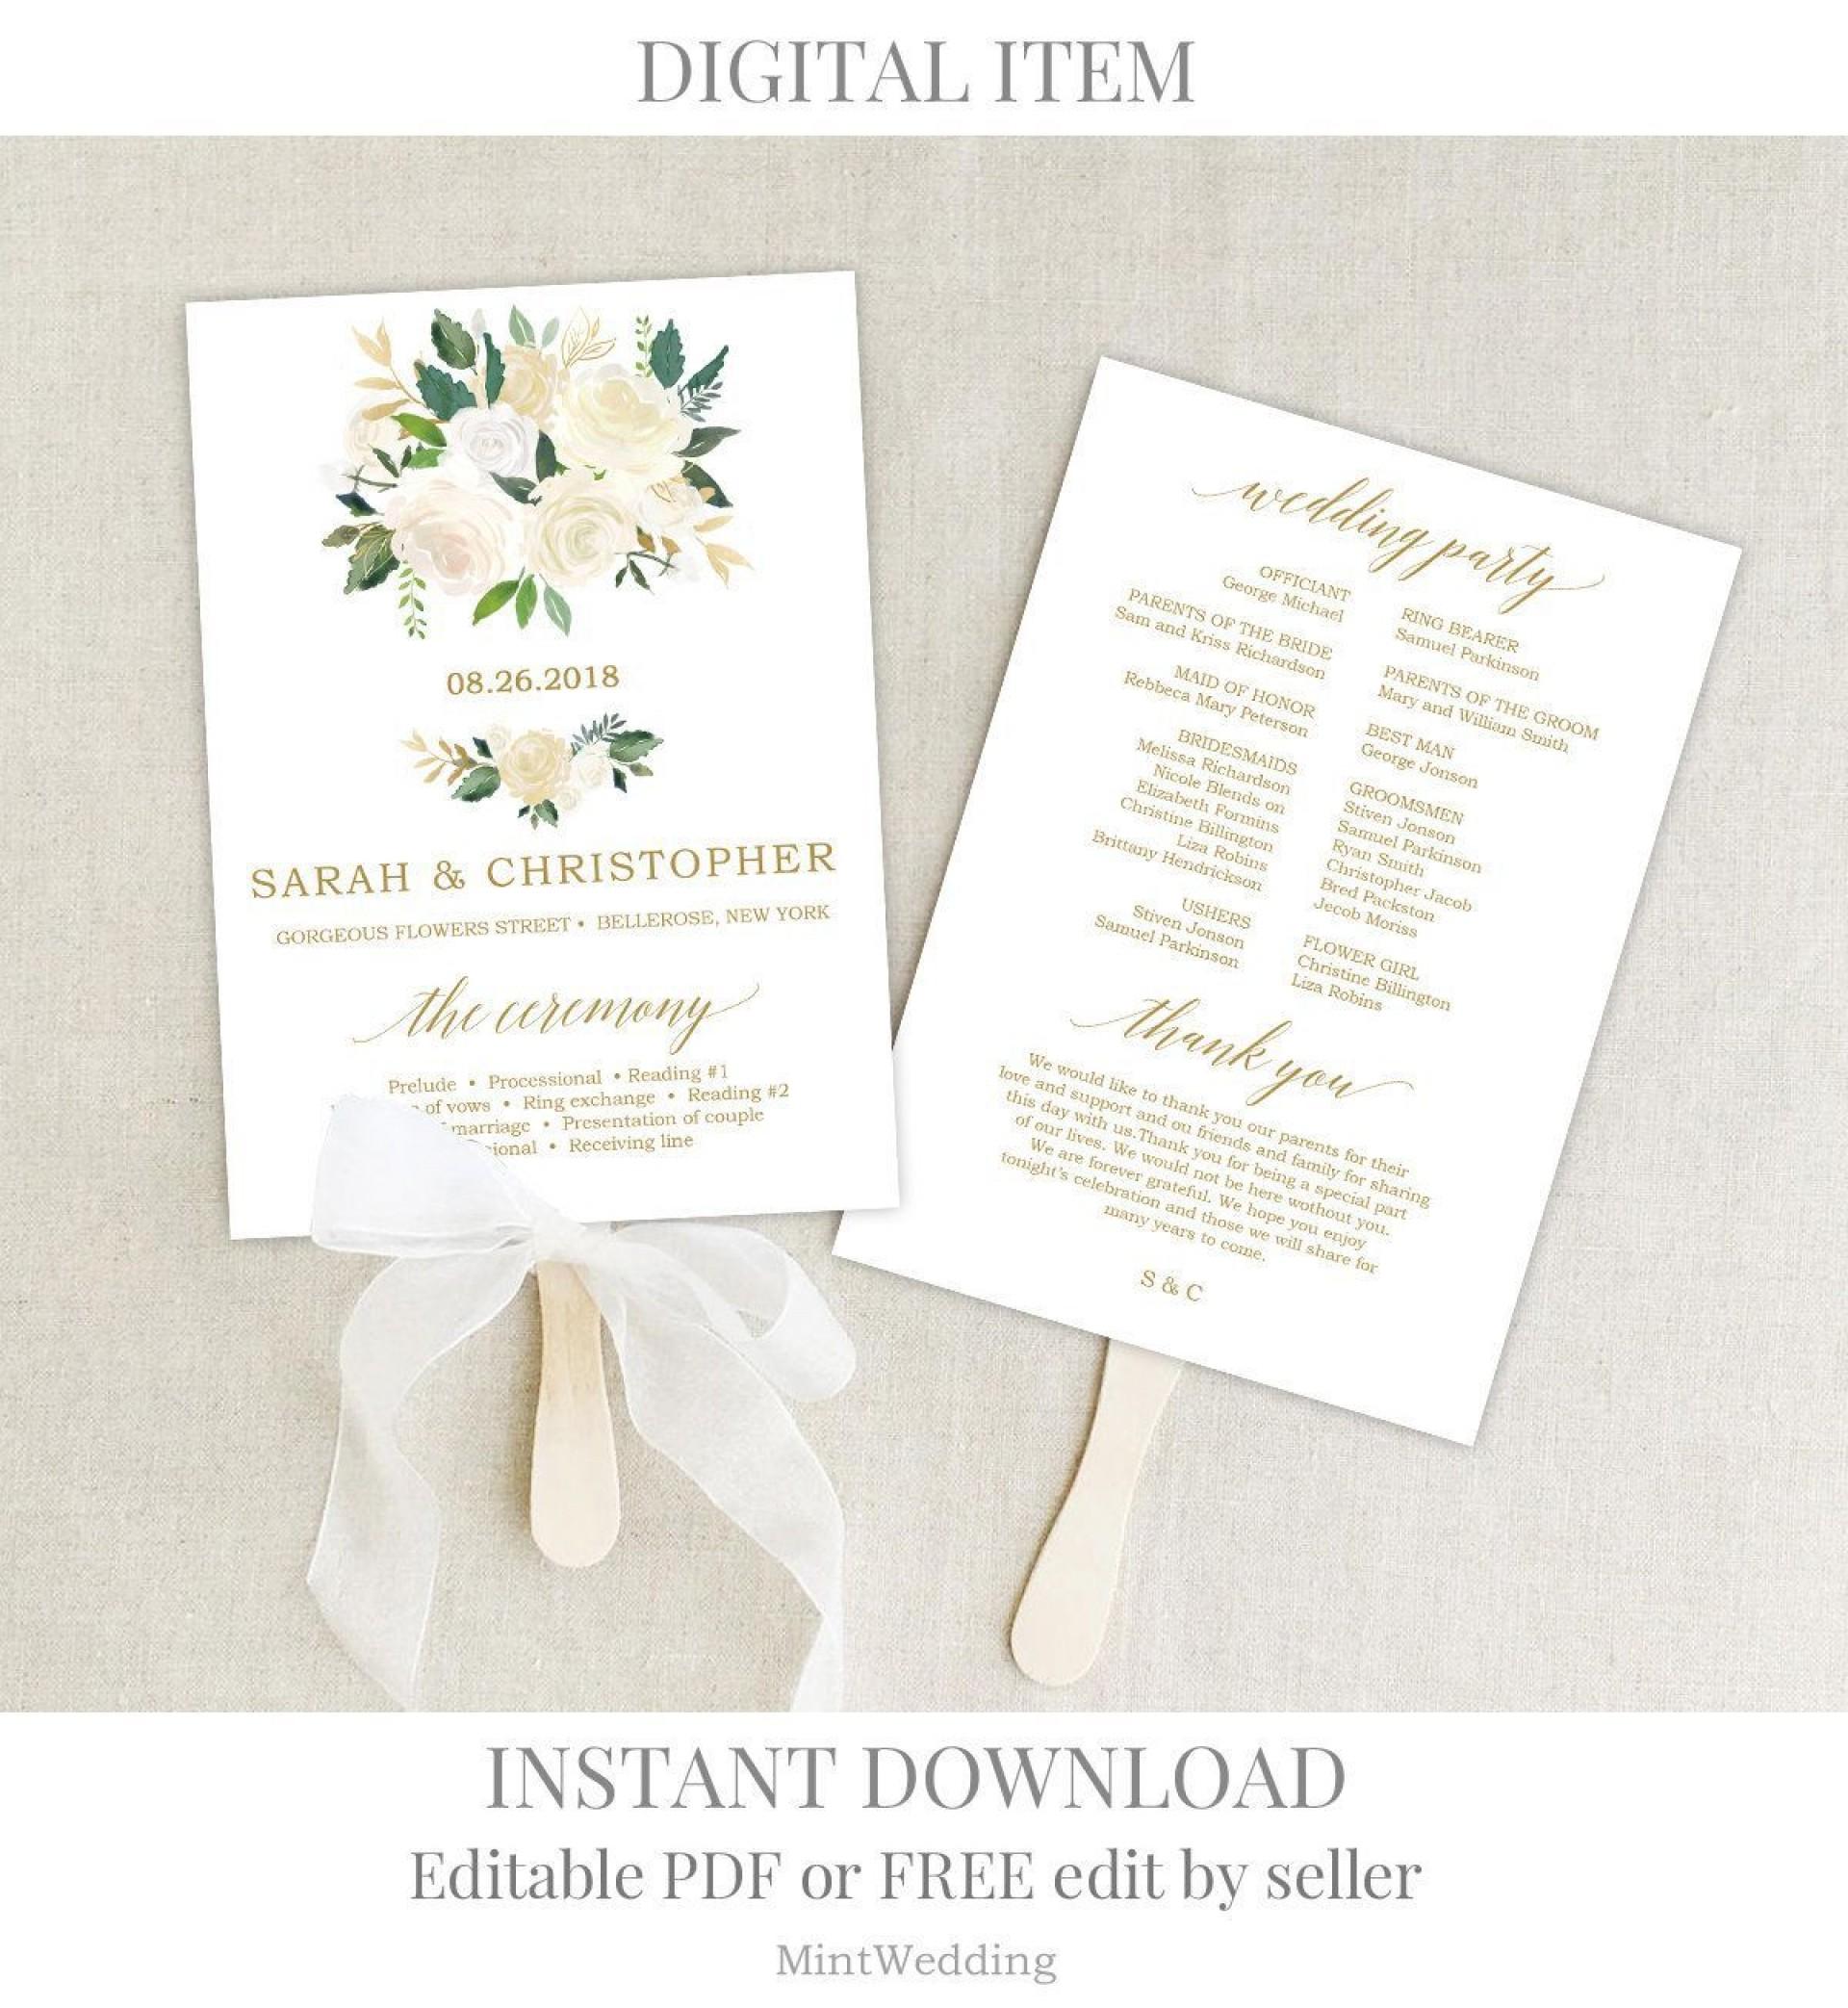 001 Rare Wedding Program Template Free Download High Def  Downloadable Pdf Reception Microsoft Word Fan1920